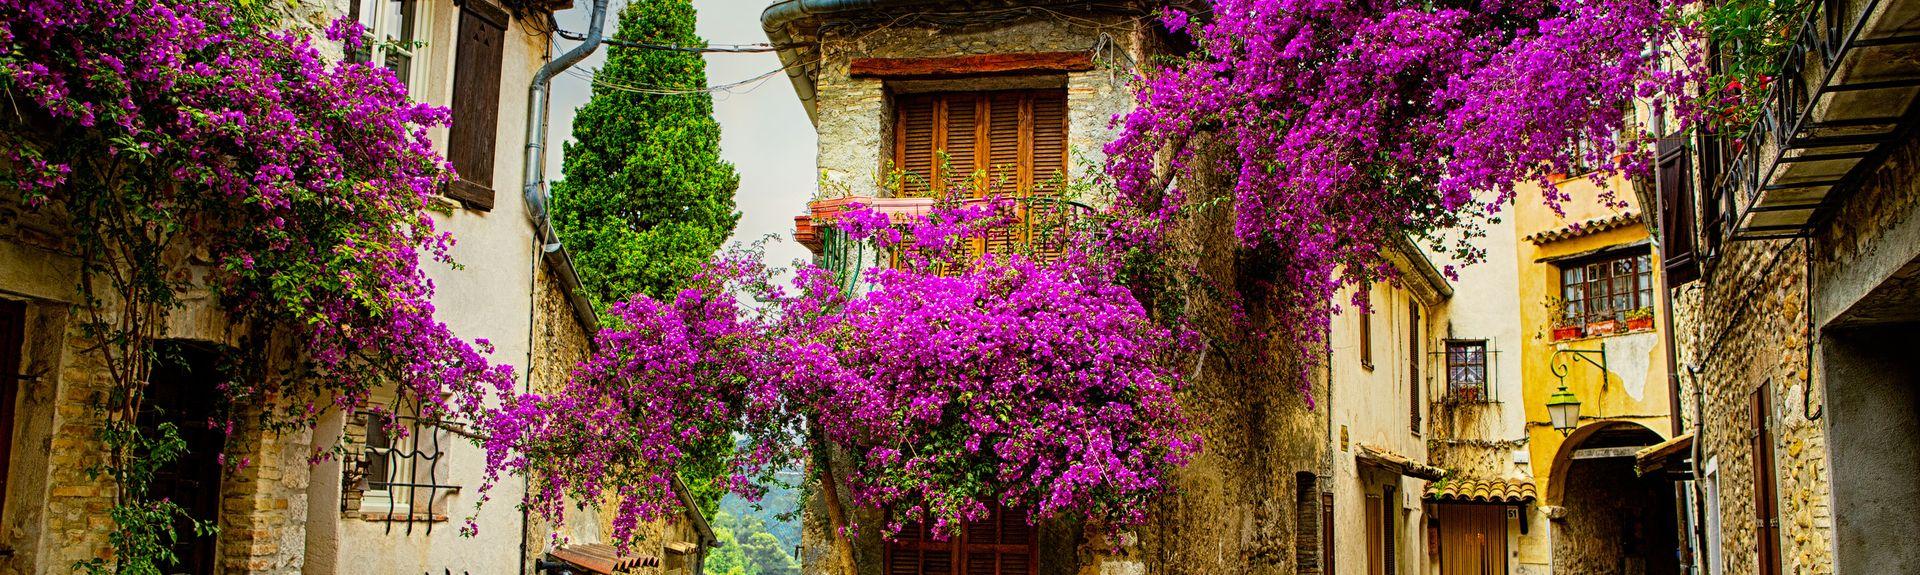 Provenza-Alpes-Costa Azul, Francia